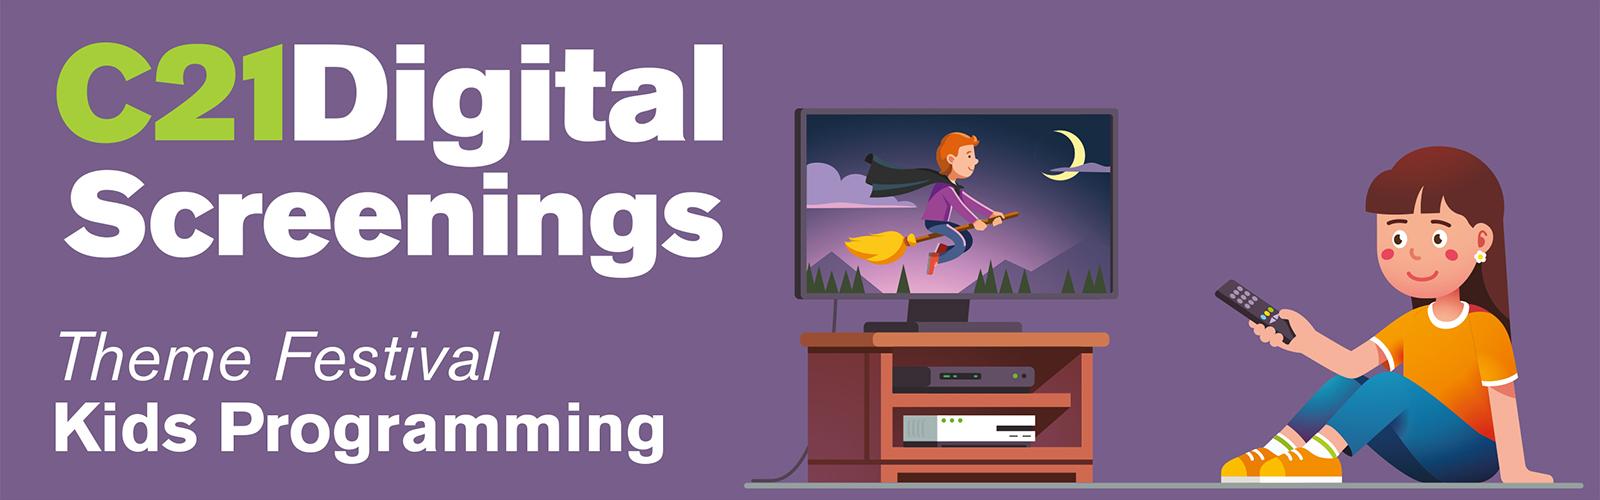 Theme Festival - Kids Programming